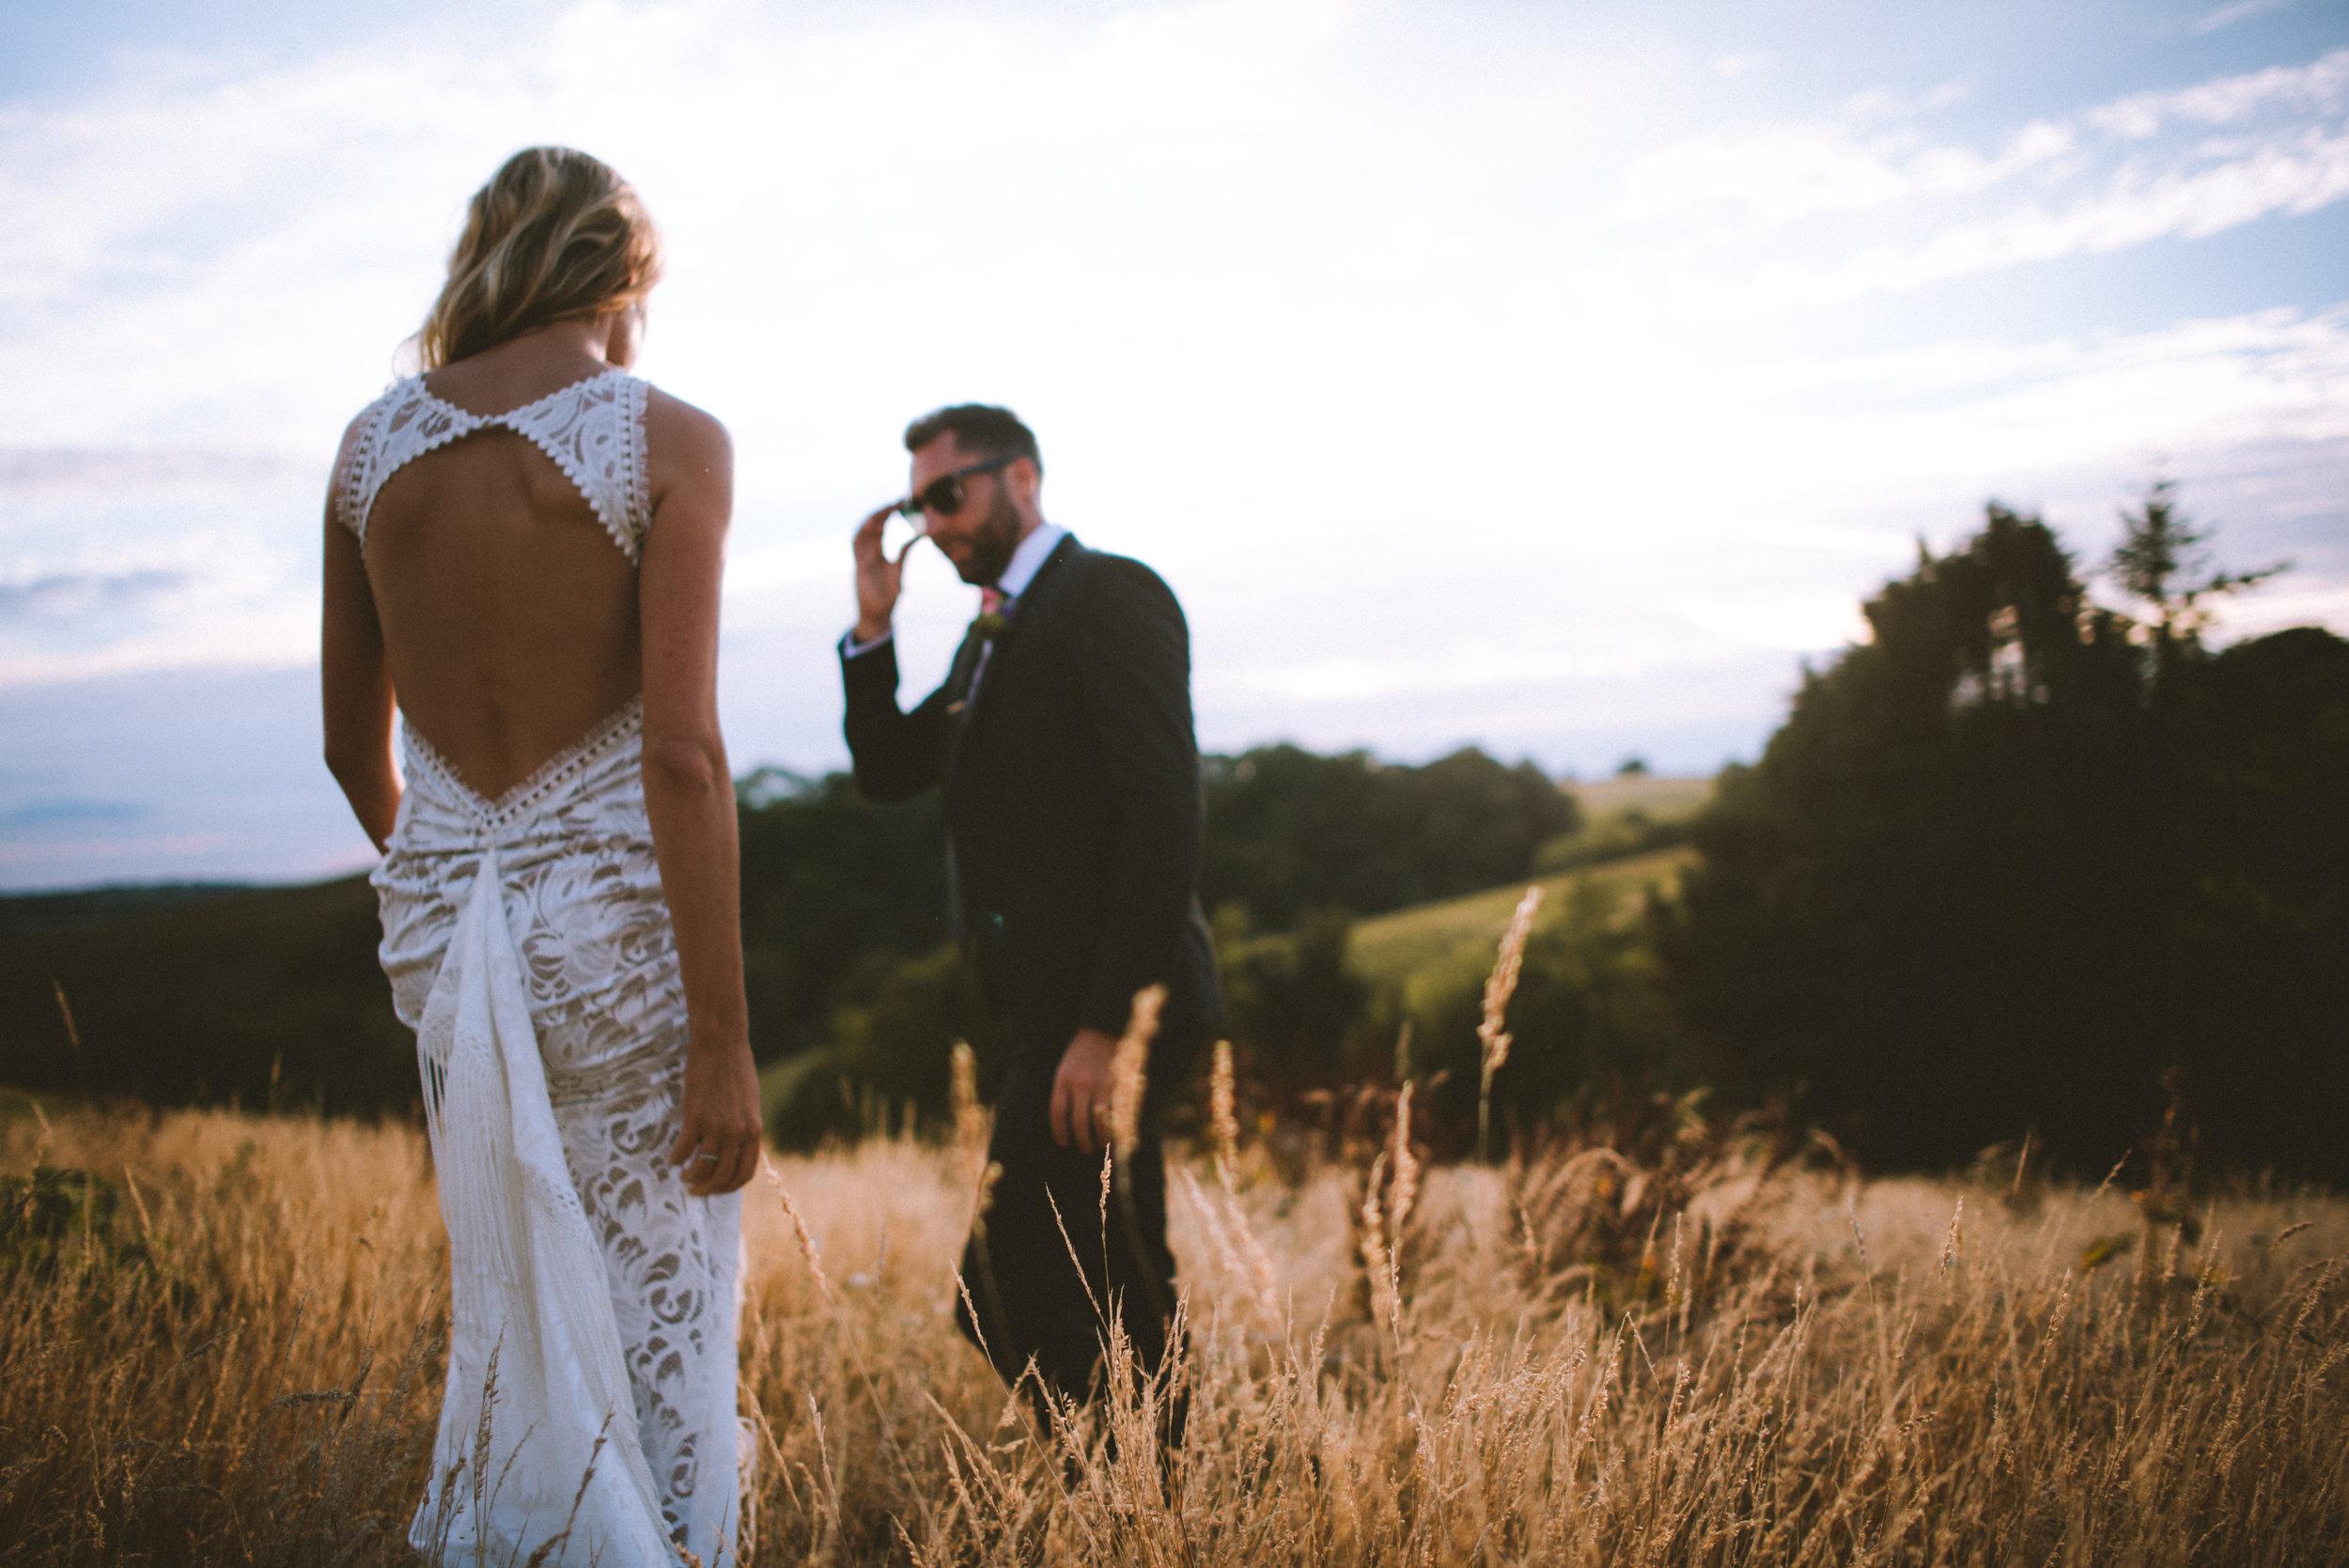 deers-leap-wedding-photographer-119.jpg